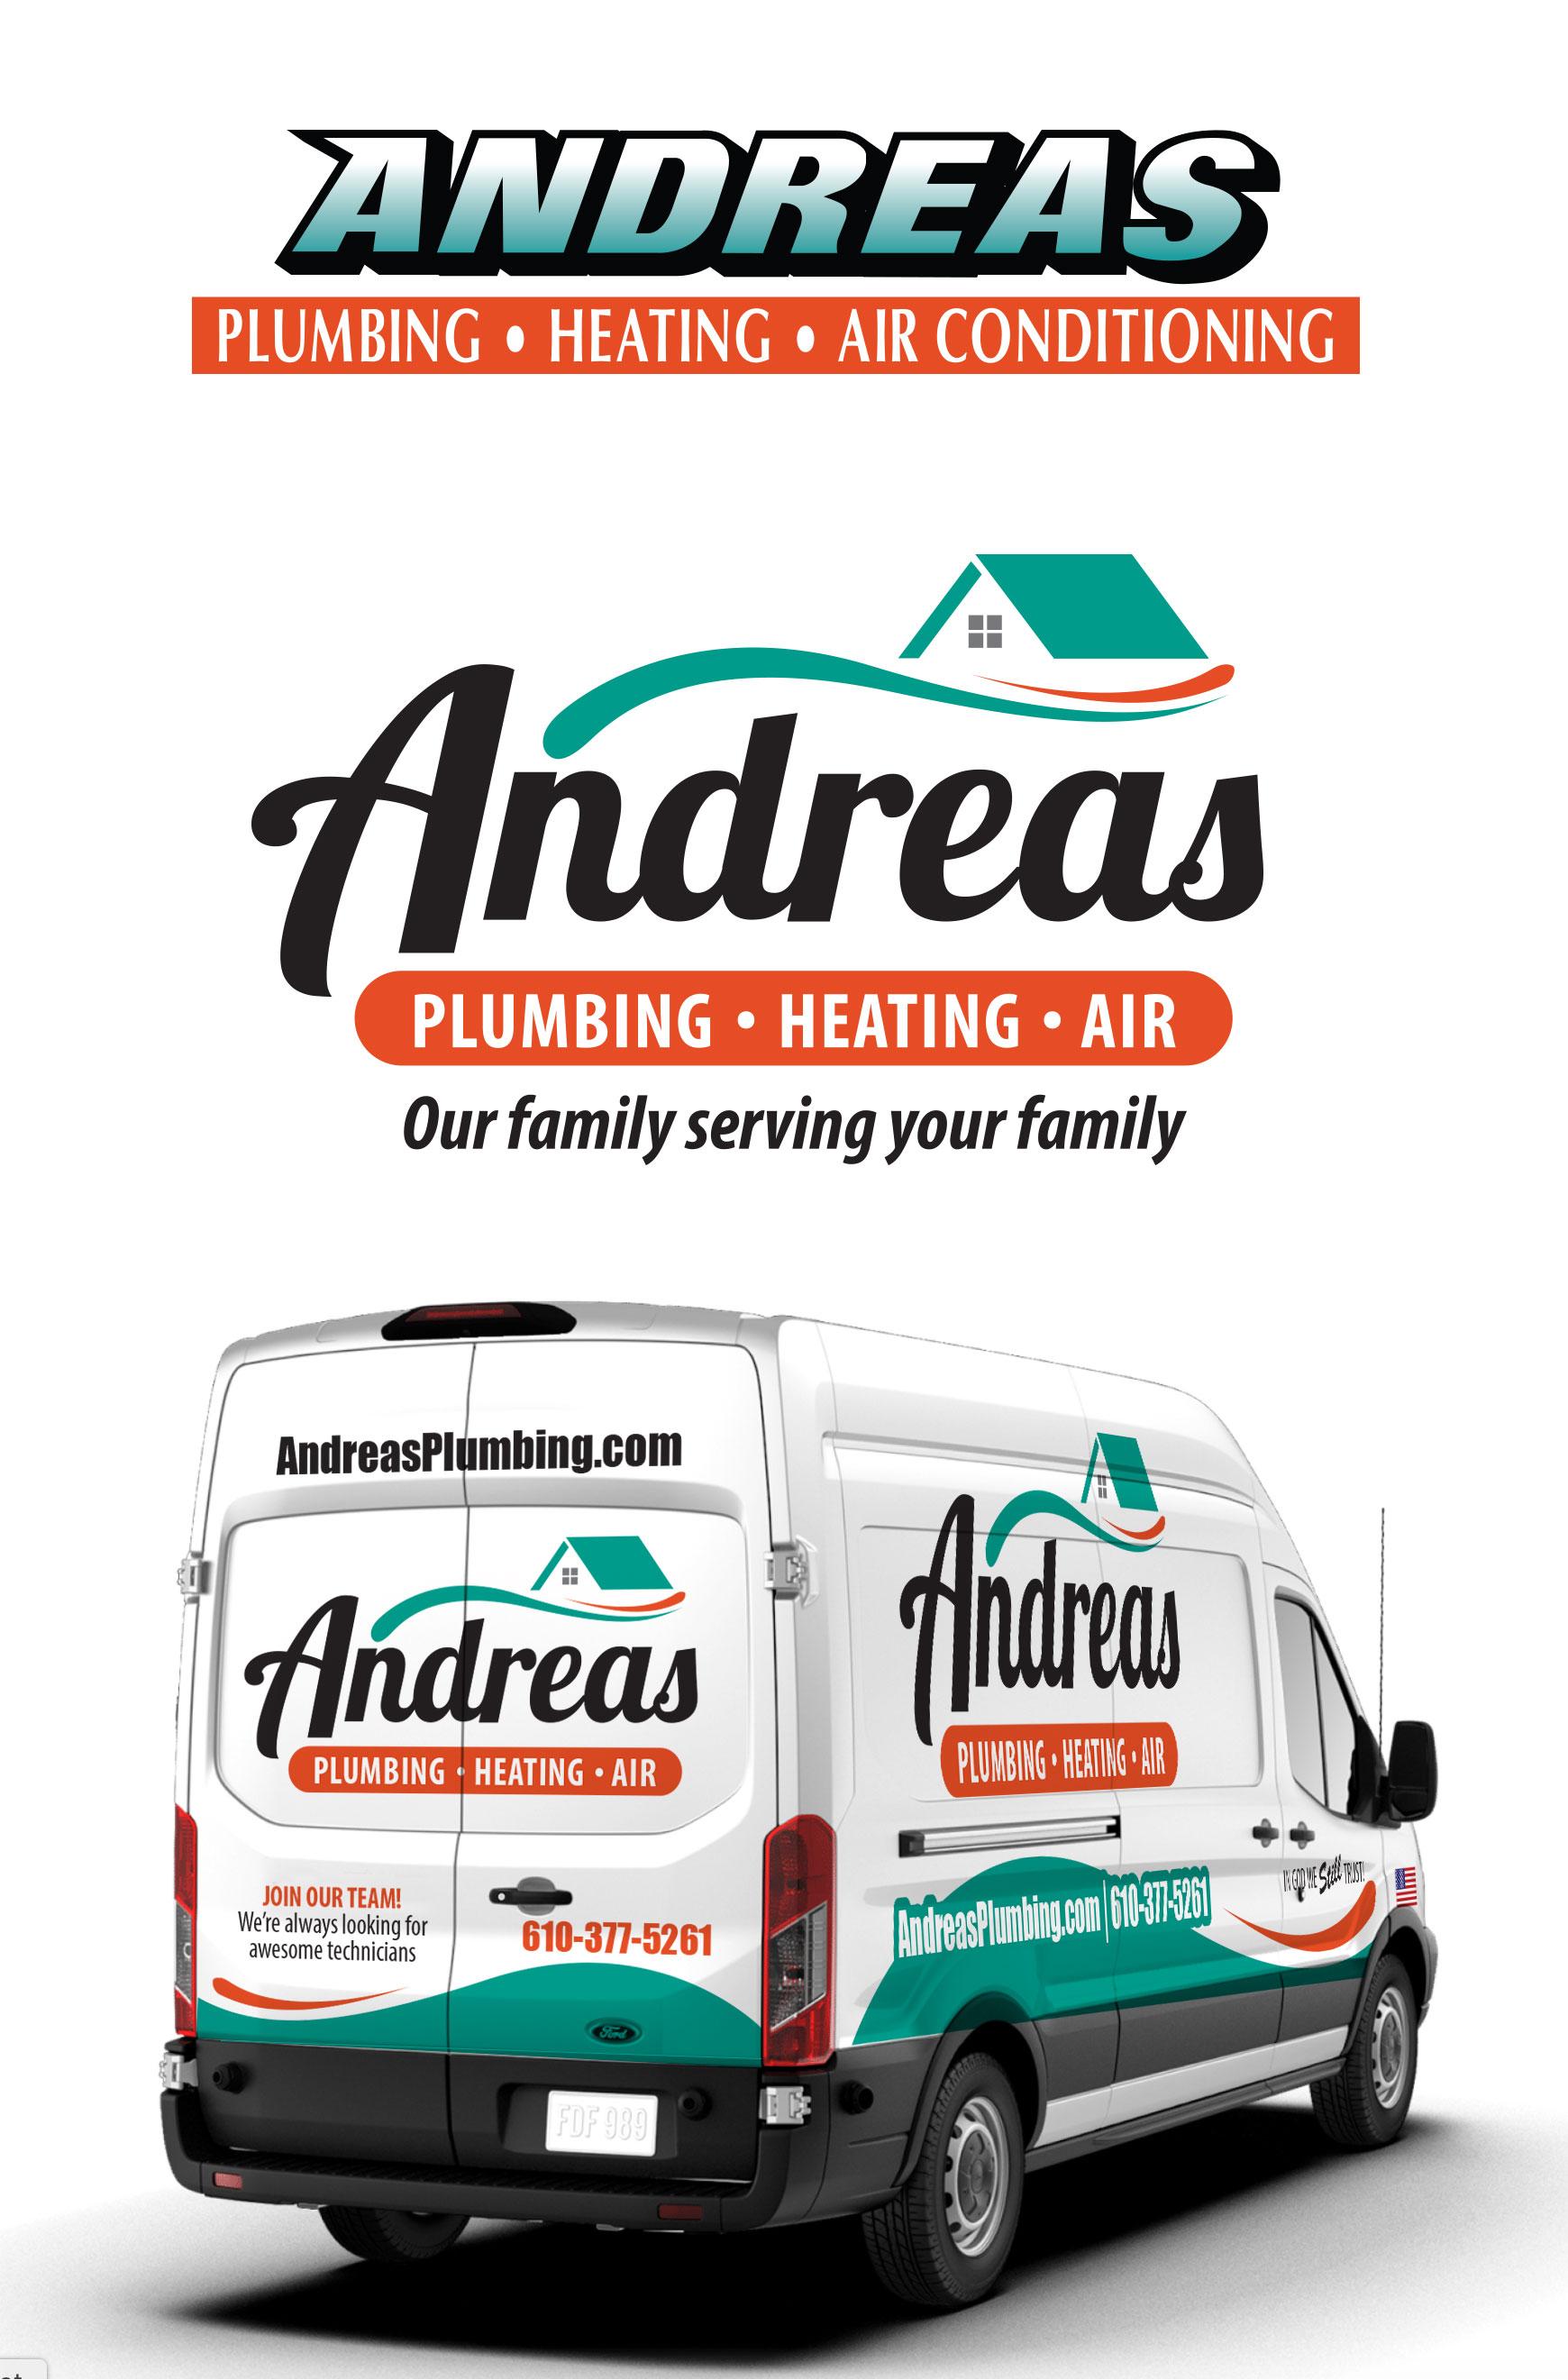 Andreas Logo & Truck Design